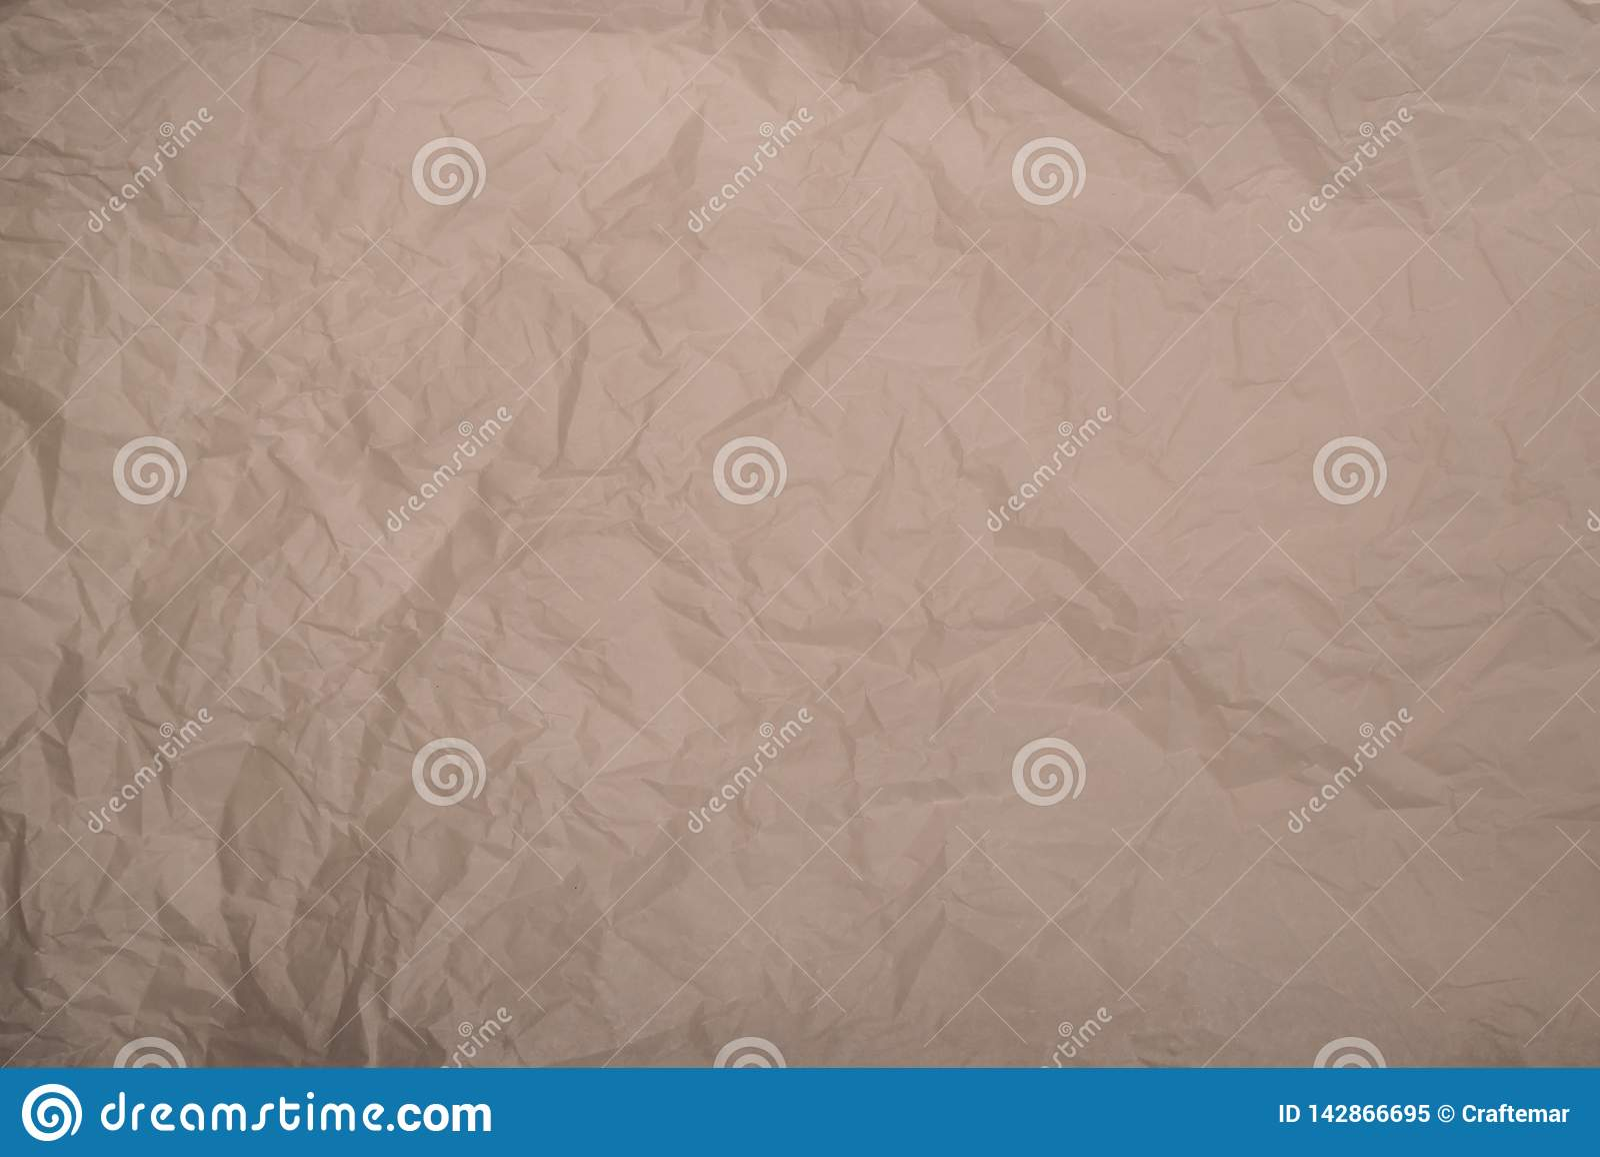 Verfrommelde document textuur